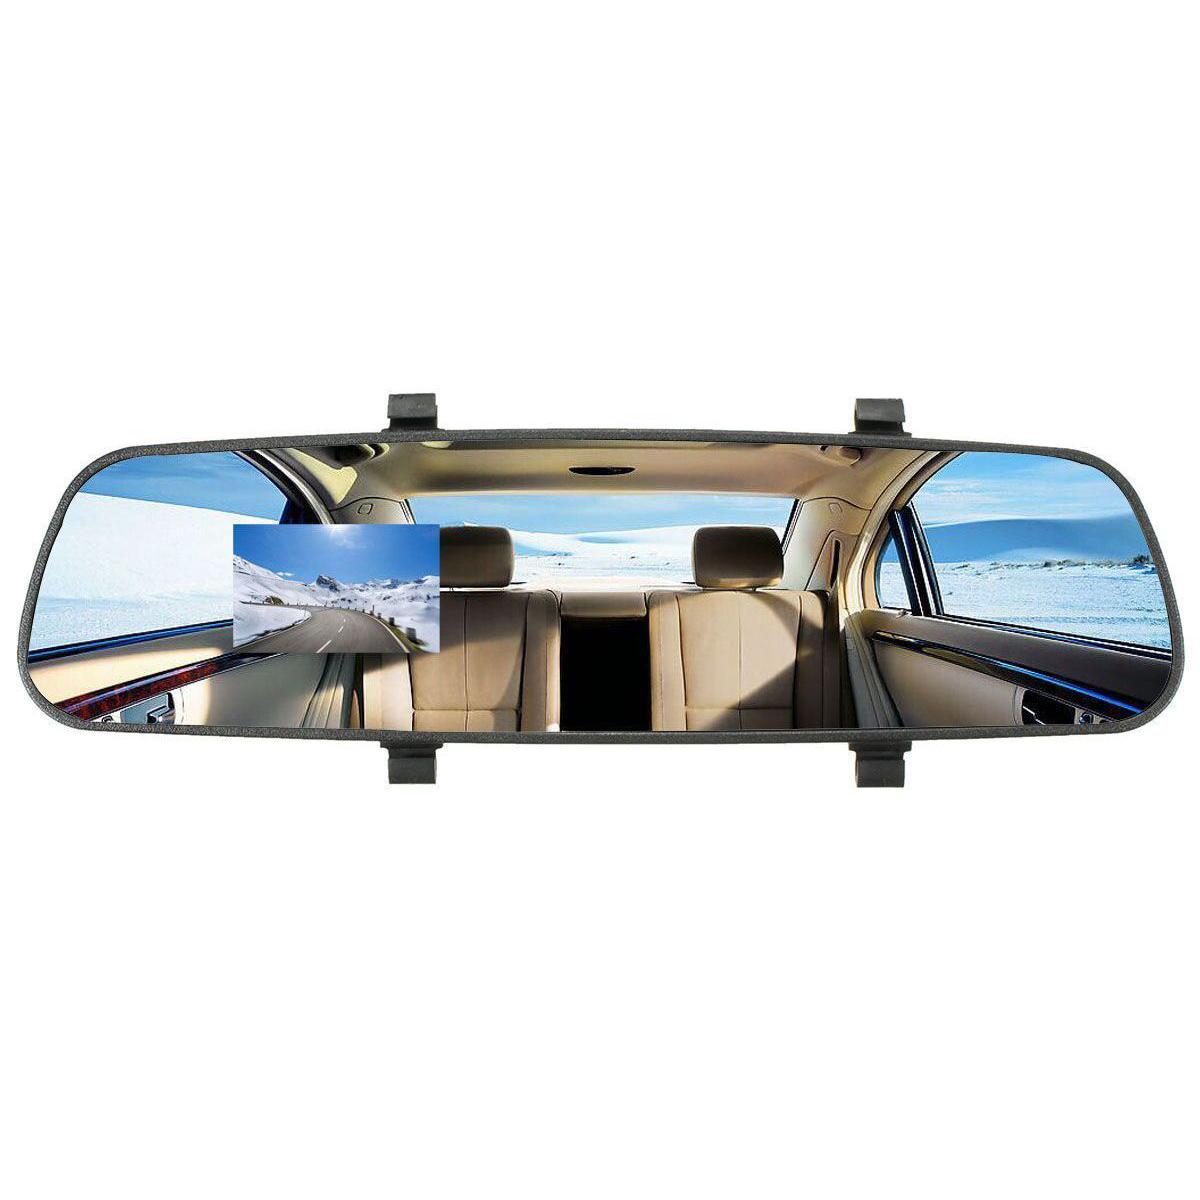 hd 1080p in car rear view mirror dash dvr cam video recorder camera monitor l3 ebay. Black Bedroom Furniture Sets. Home Design Ideas